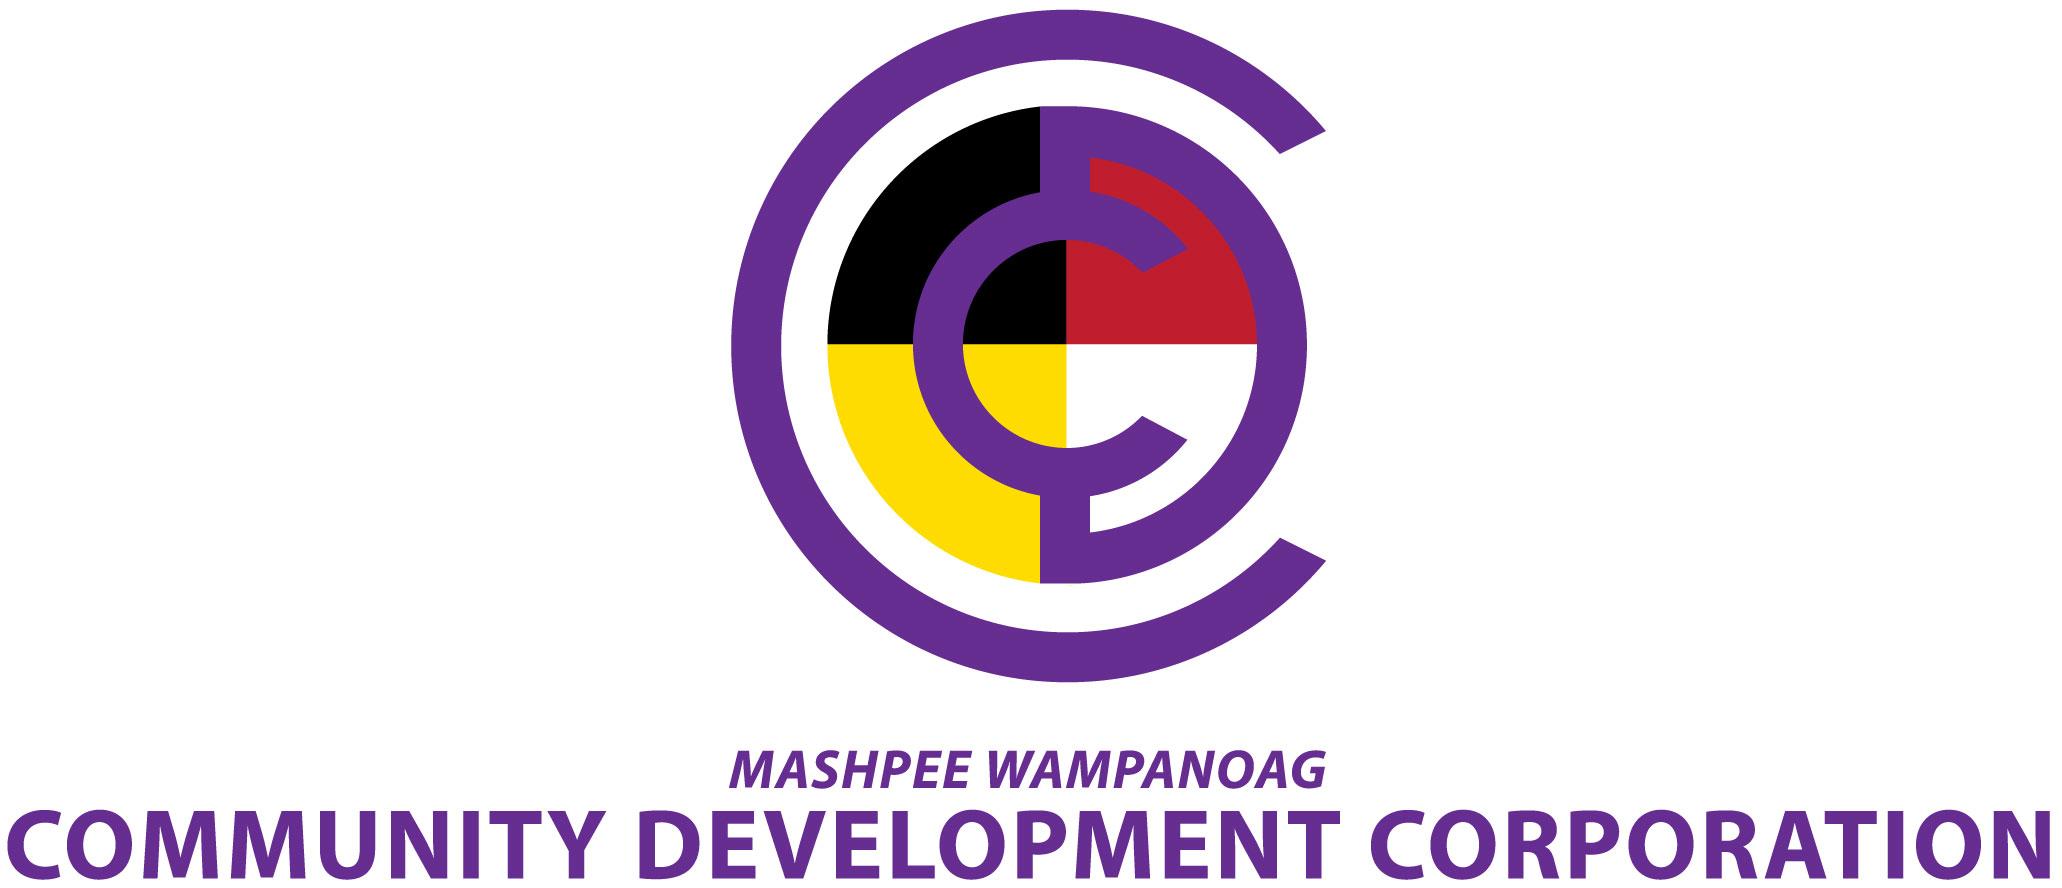 Mashpee Wampanoag Community Development Corporation Responds To